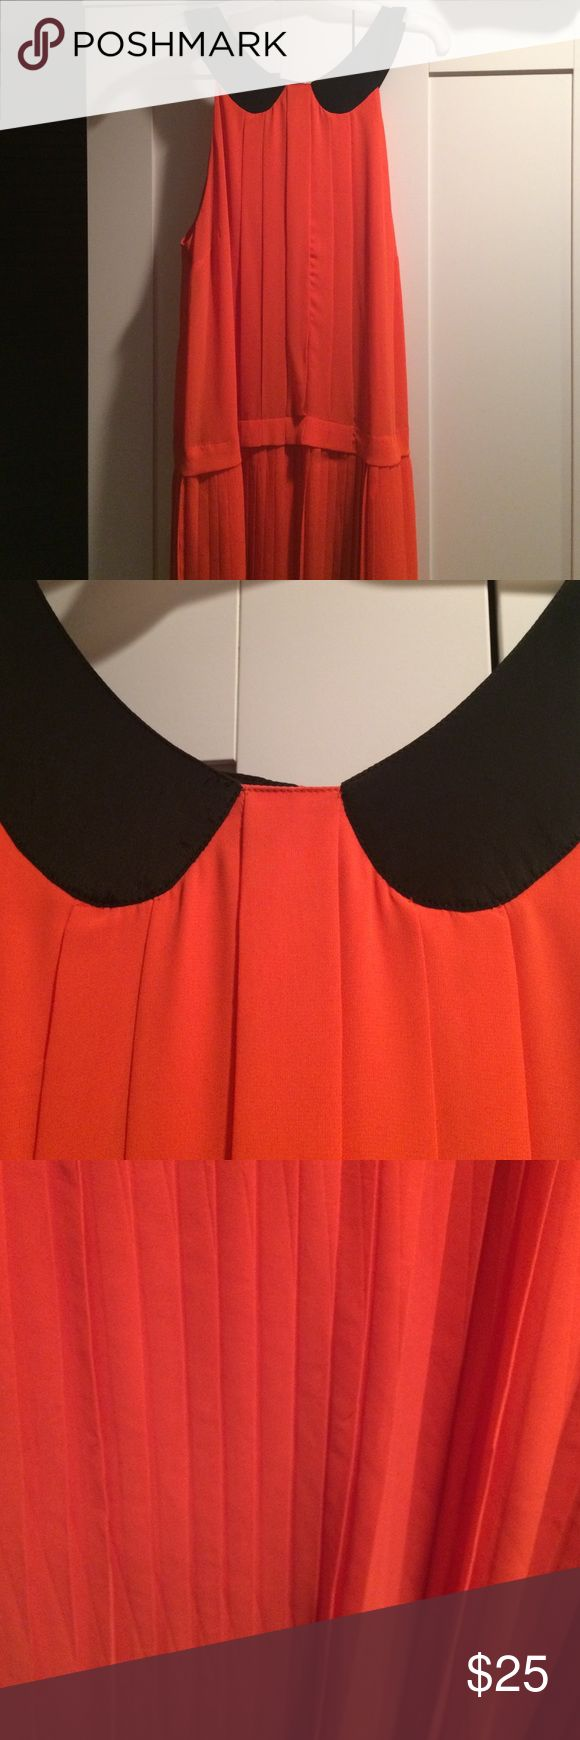 W118 by Walter Baker dress Orange and black dropwaist dress with pleated skirt W118 by Walter Baker Dresses Midi